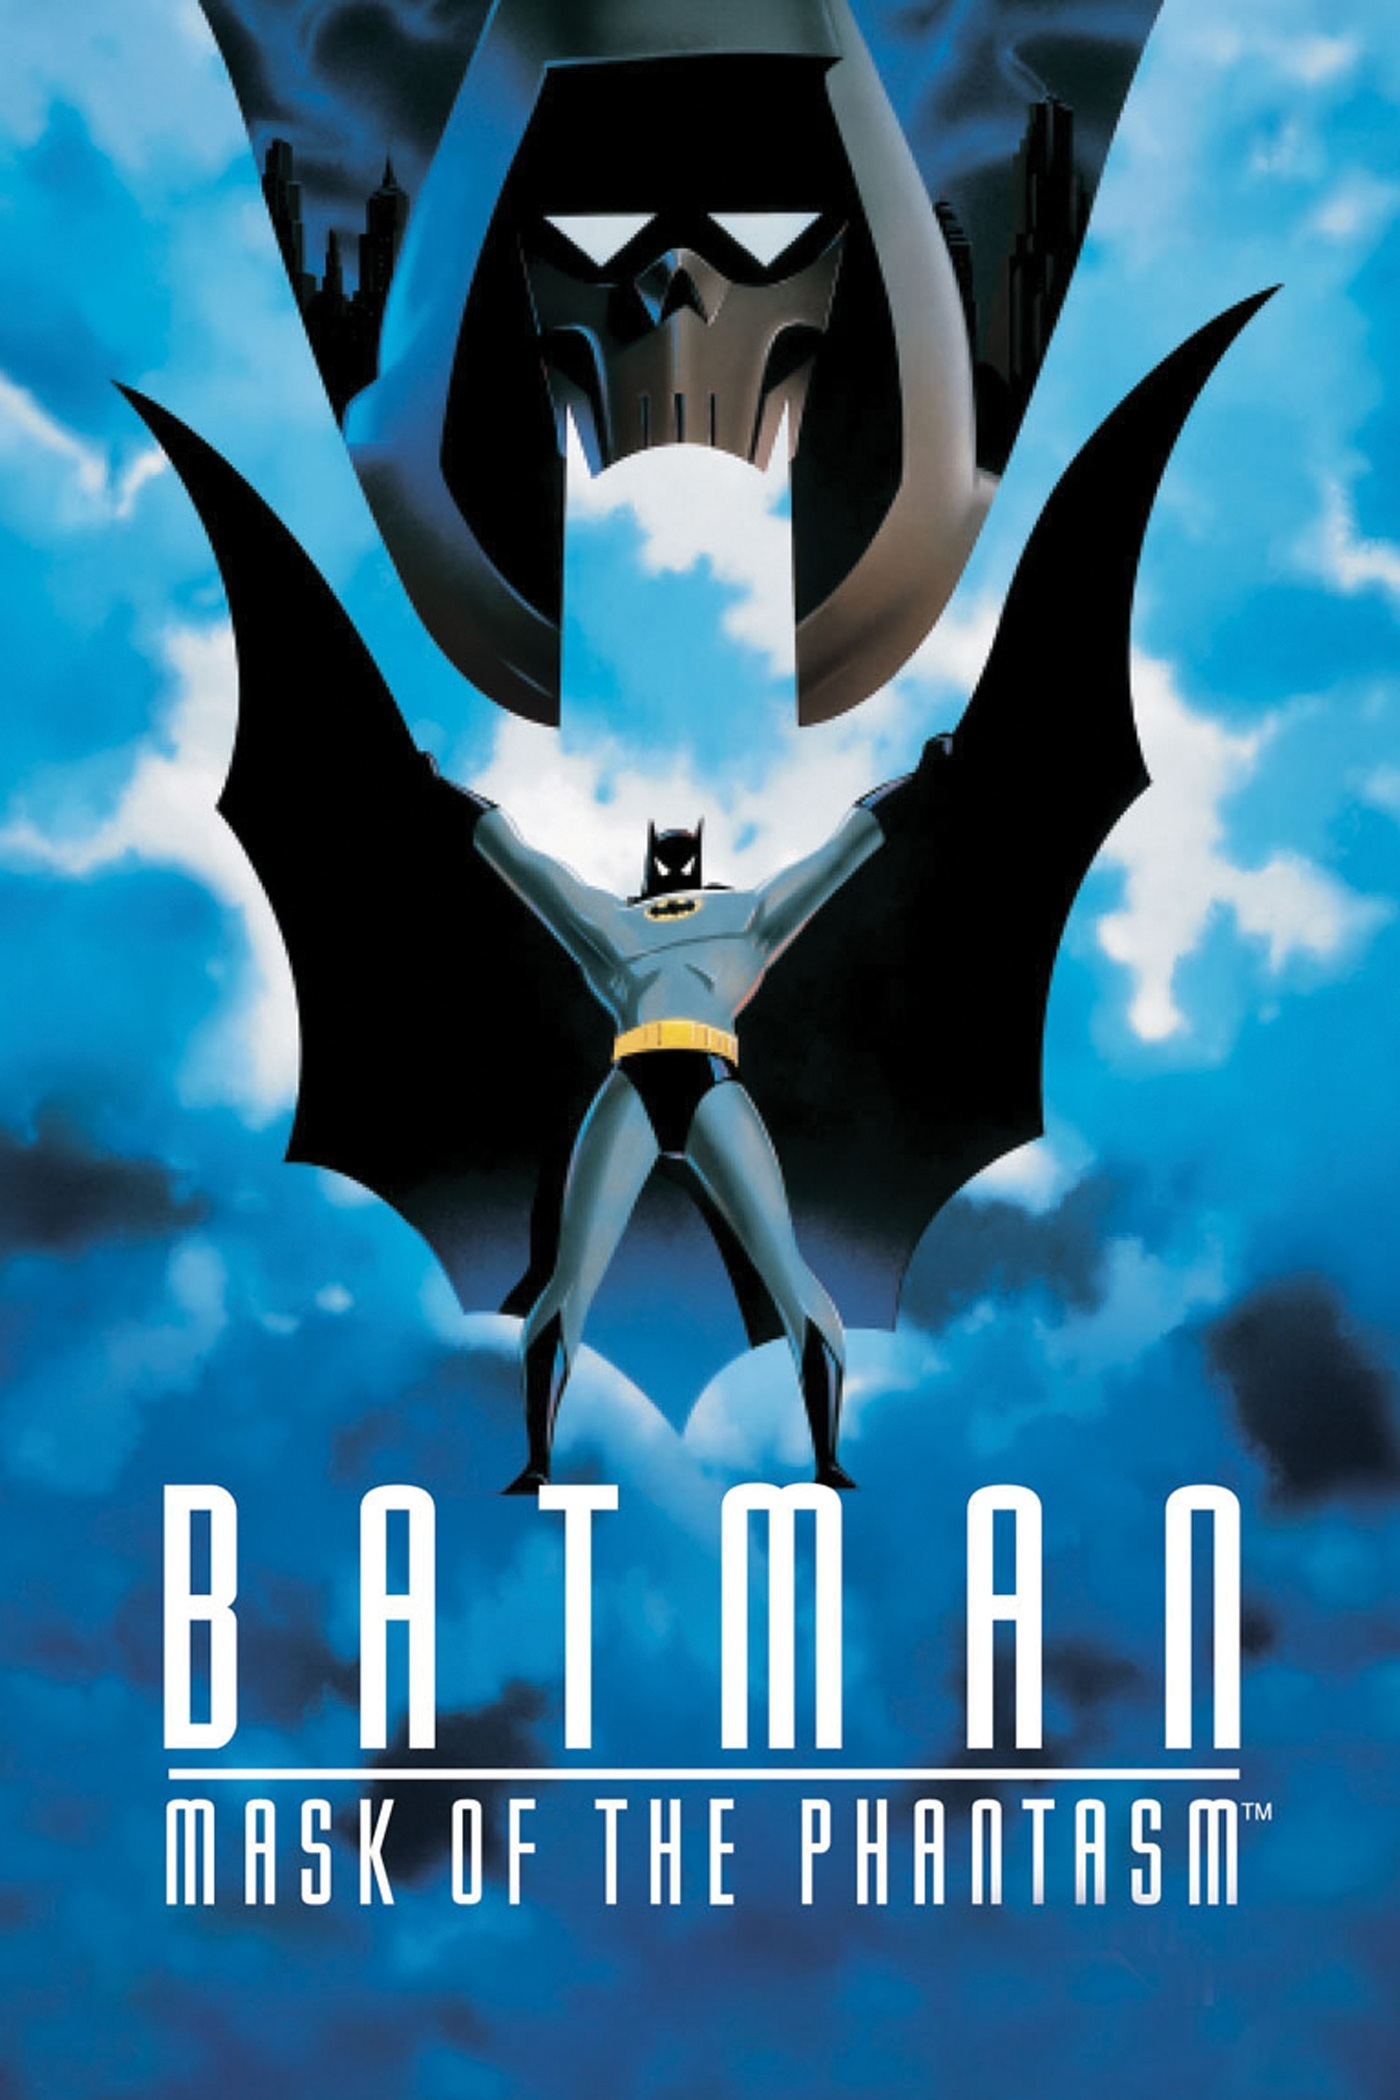 Batman Mask Of The Phantasm (1993) 720p BluRay x264 ESubs Dual Audio [Hindi DD2.0 + English DD2.0]